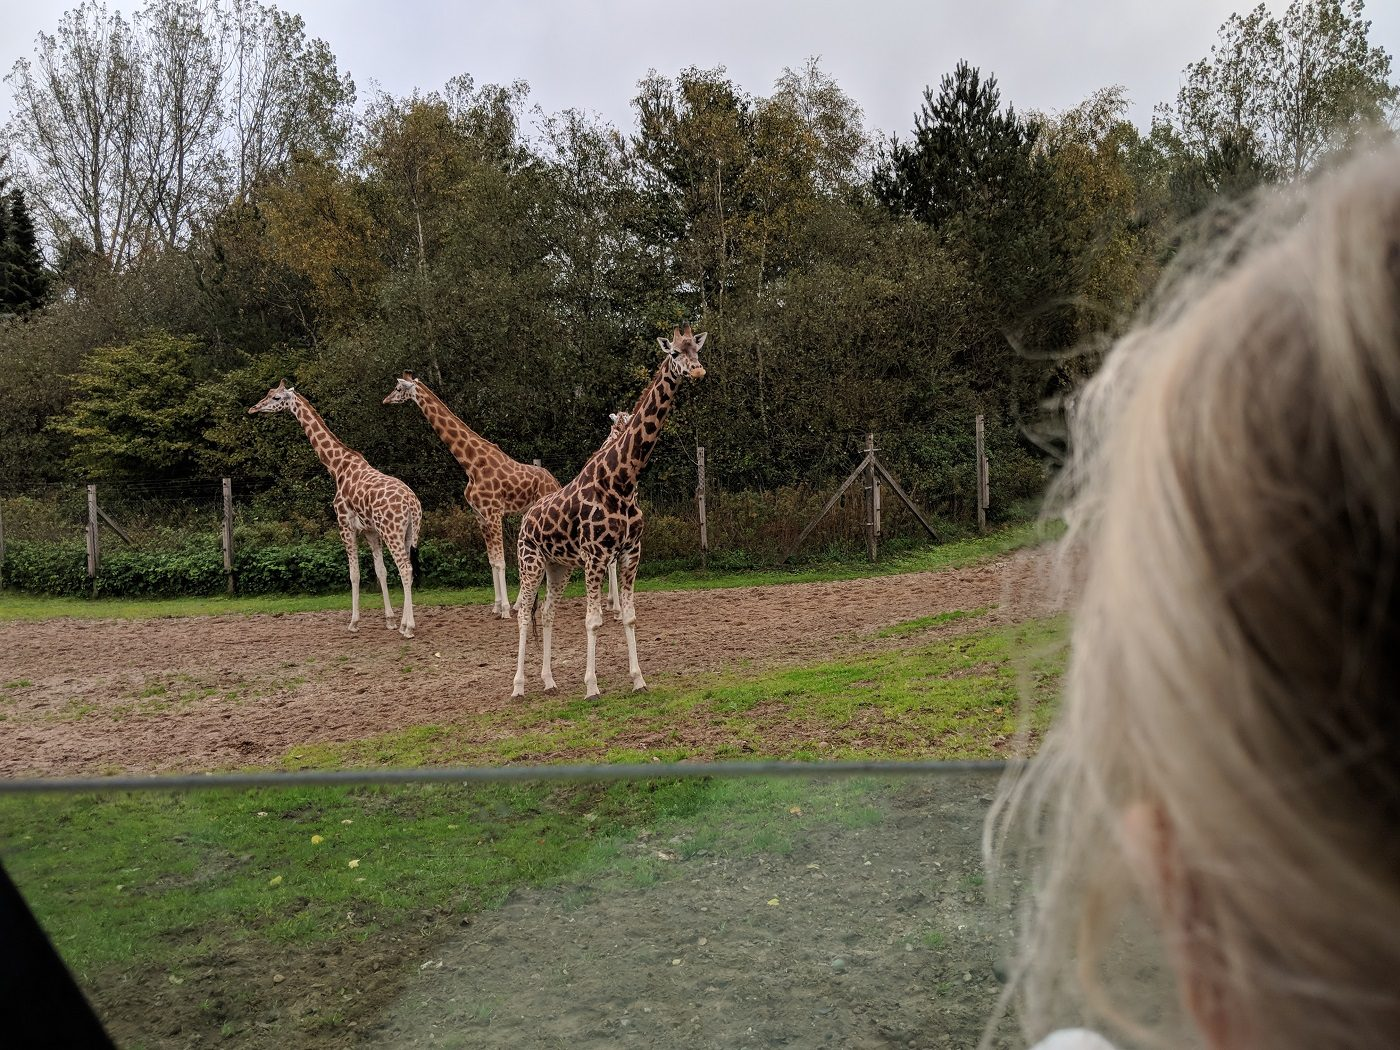 Givskud Zoo Giraffe